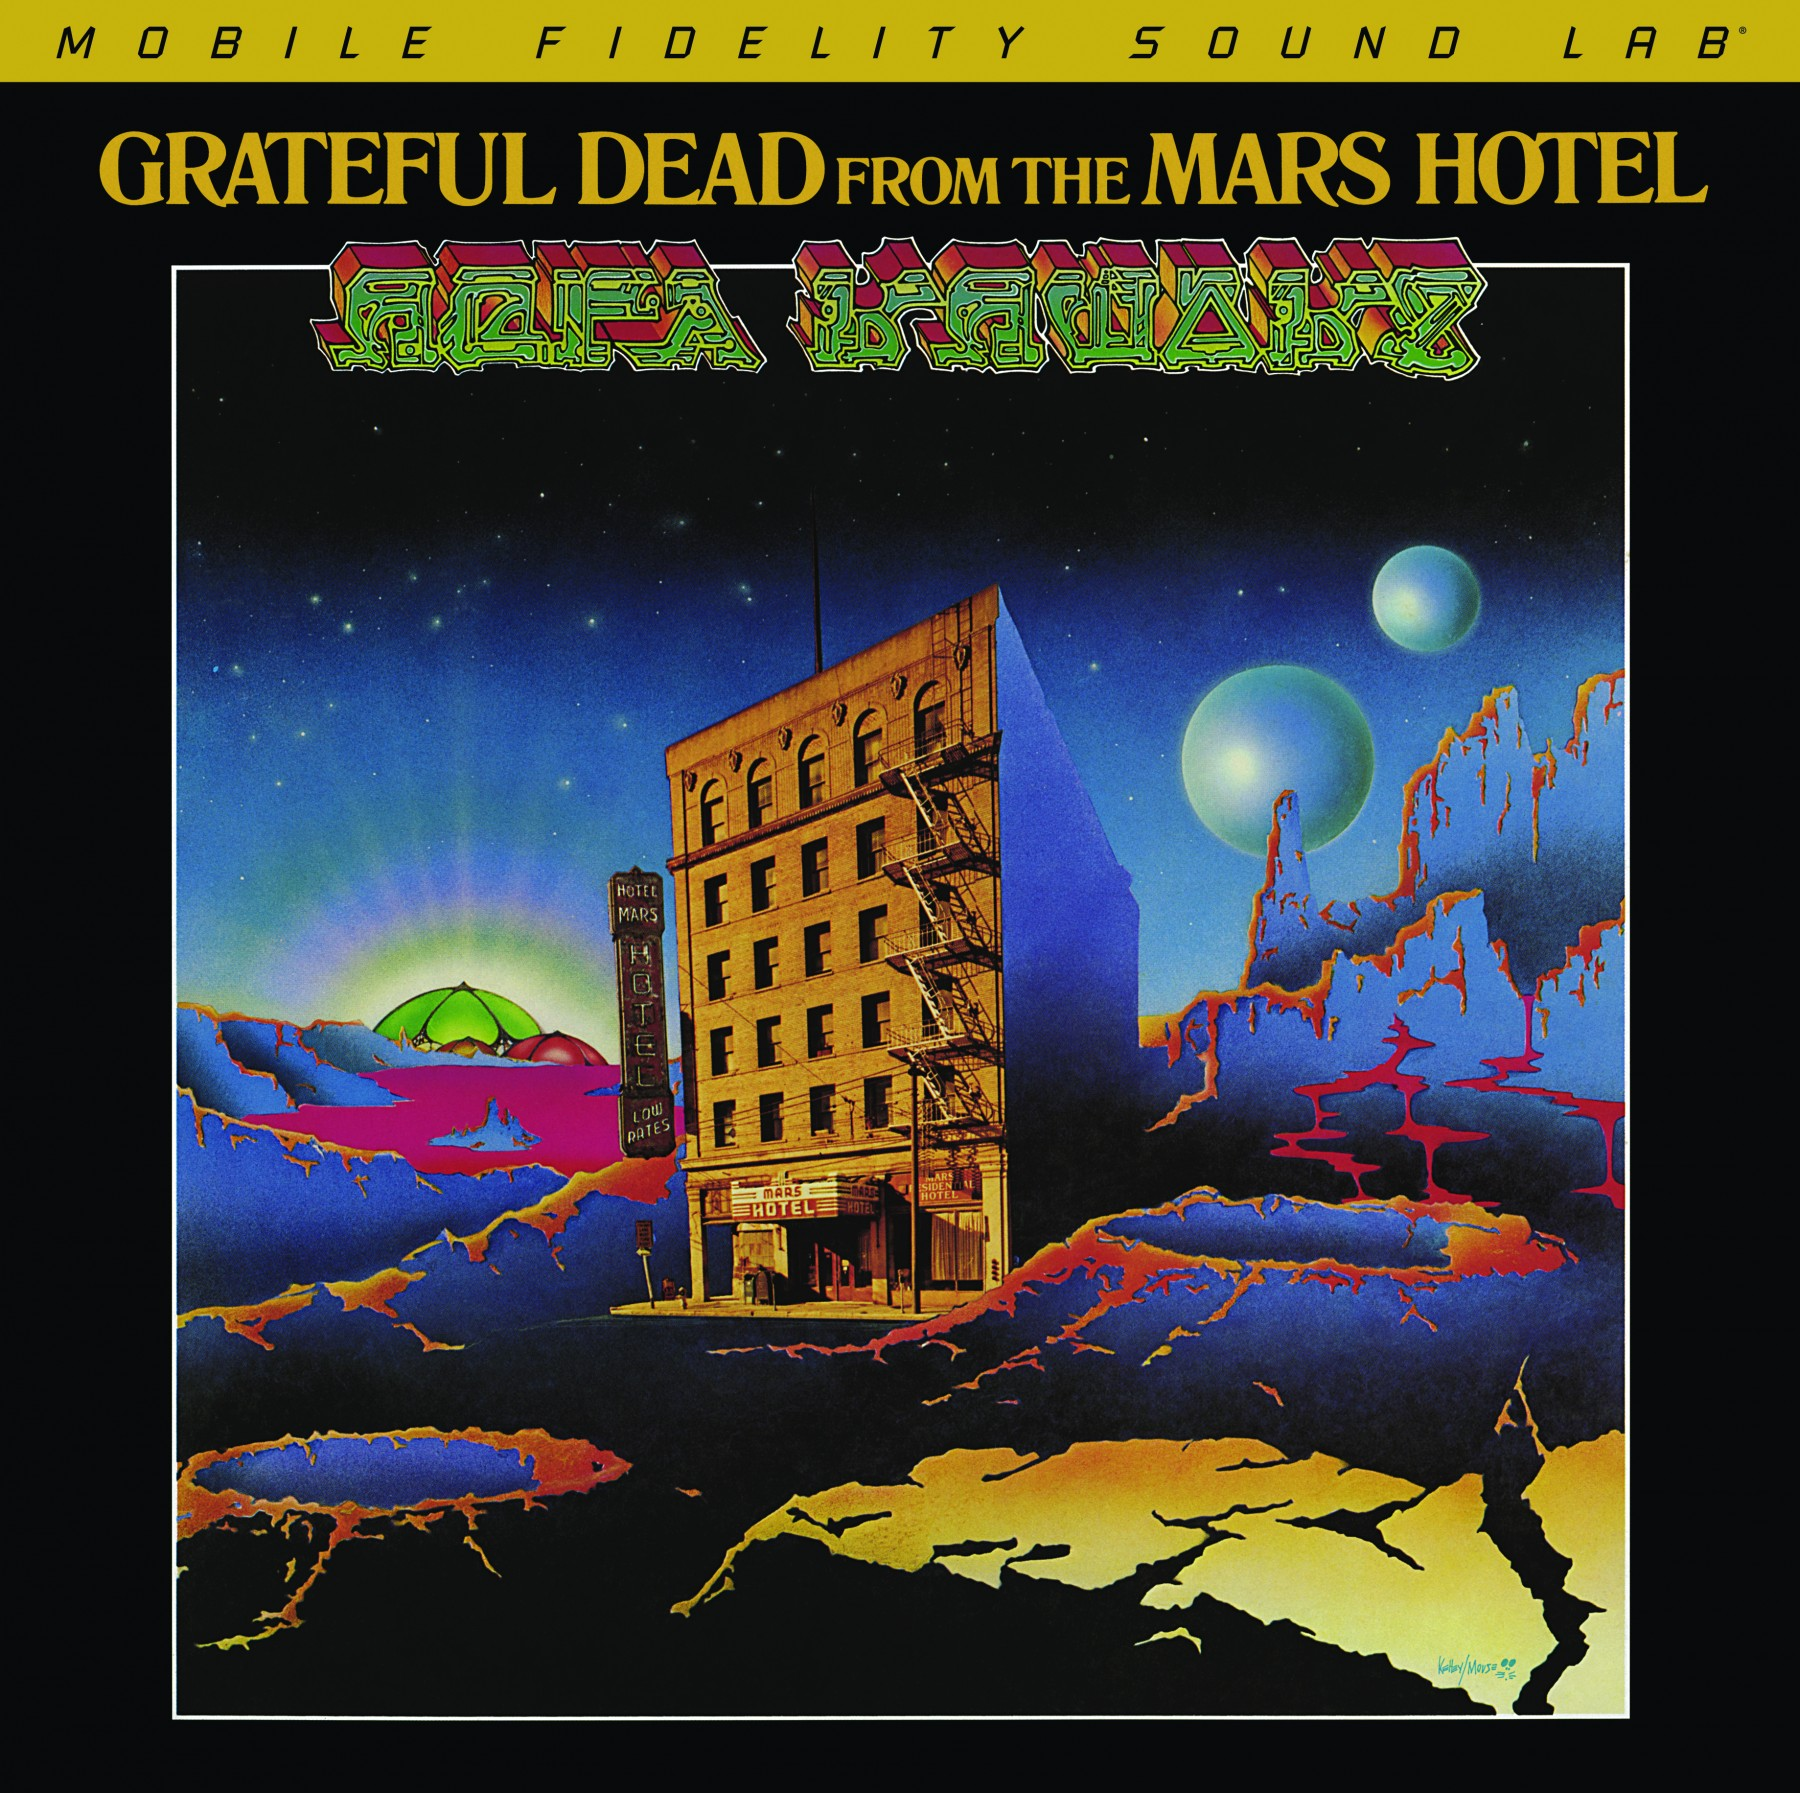 Grateful Dead: From The Mars Hotel - MFSL Hybrid Stereo SACD (UDSACD 2196)